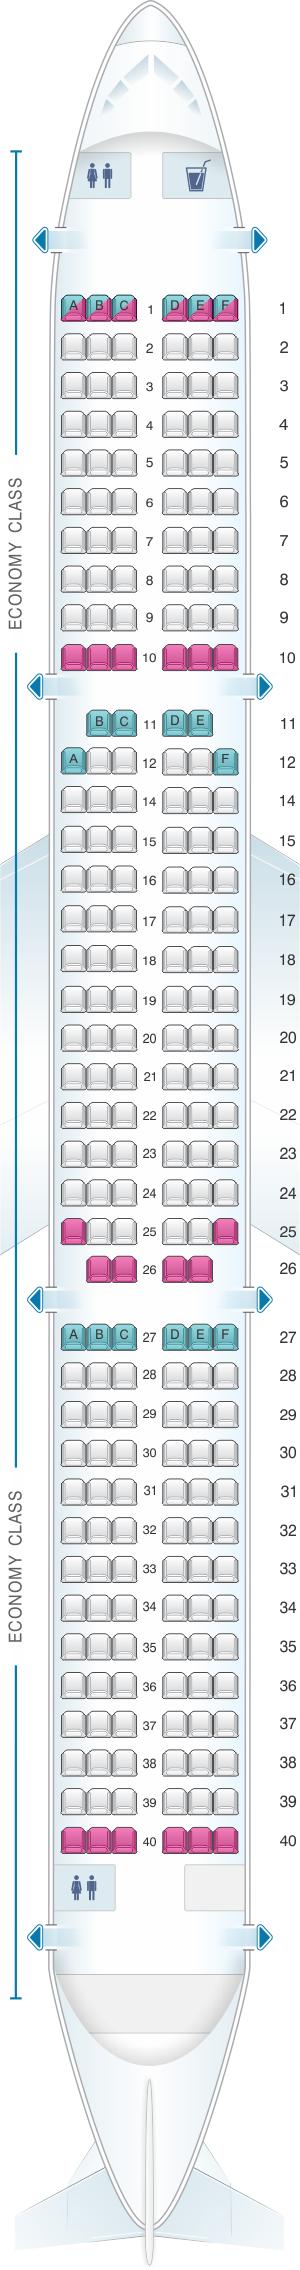 Seat map for Cebu Pacific Air Airbus A321